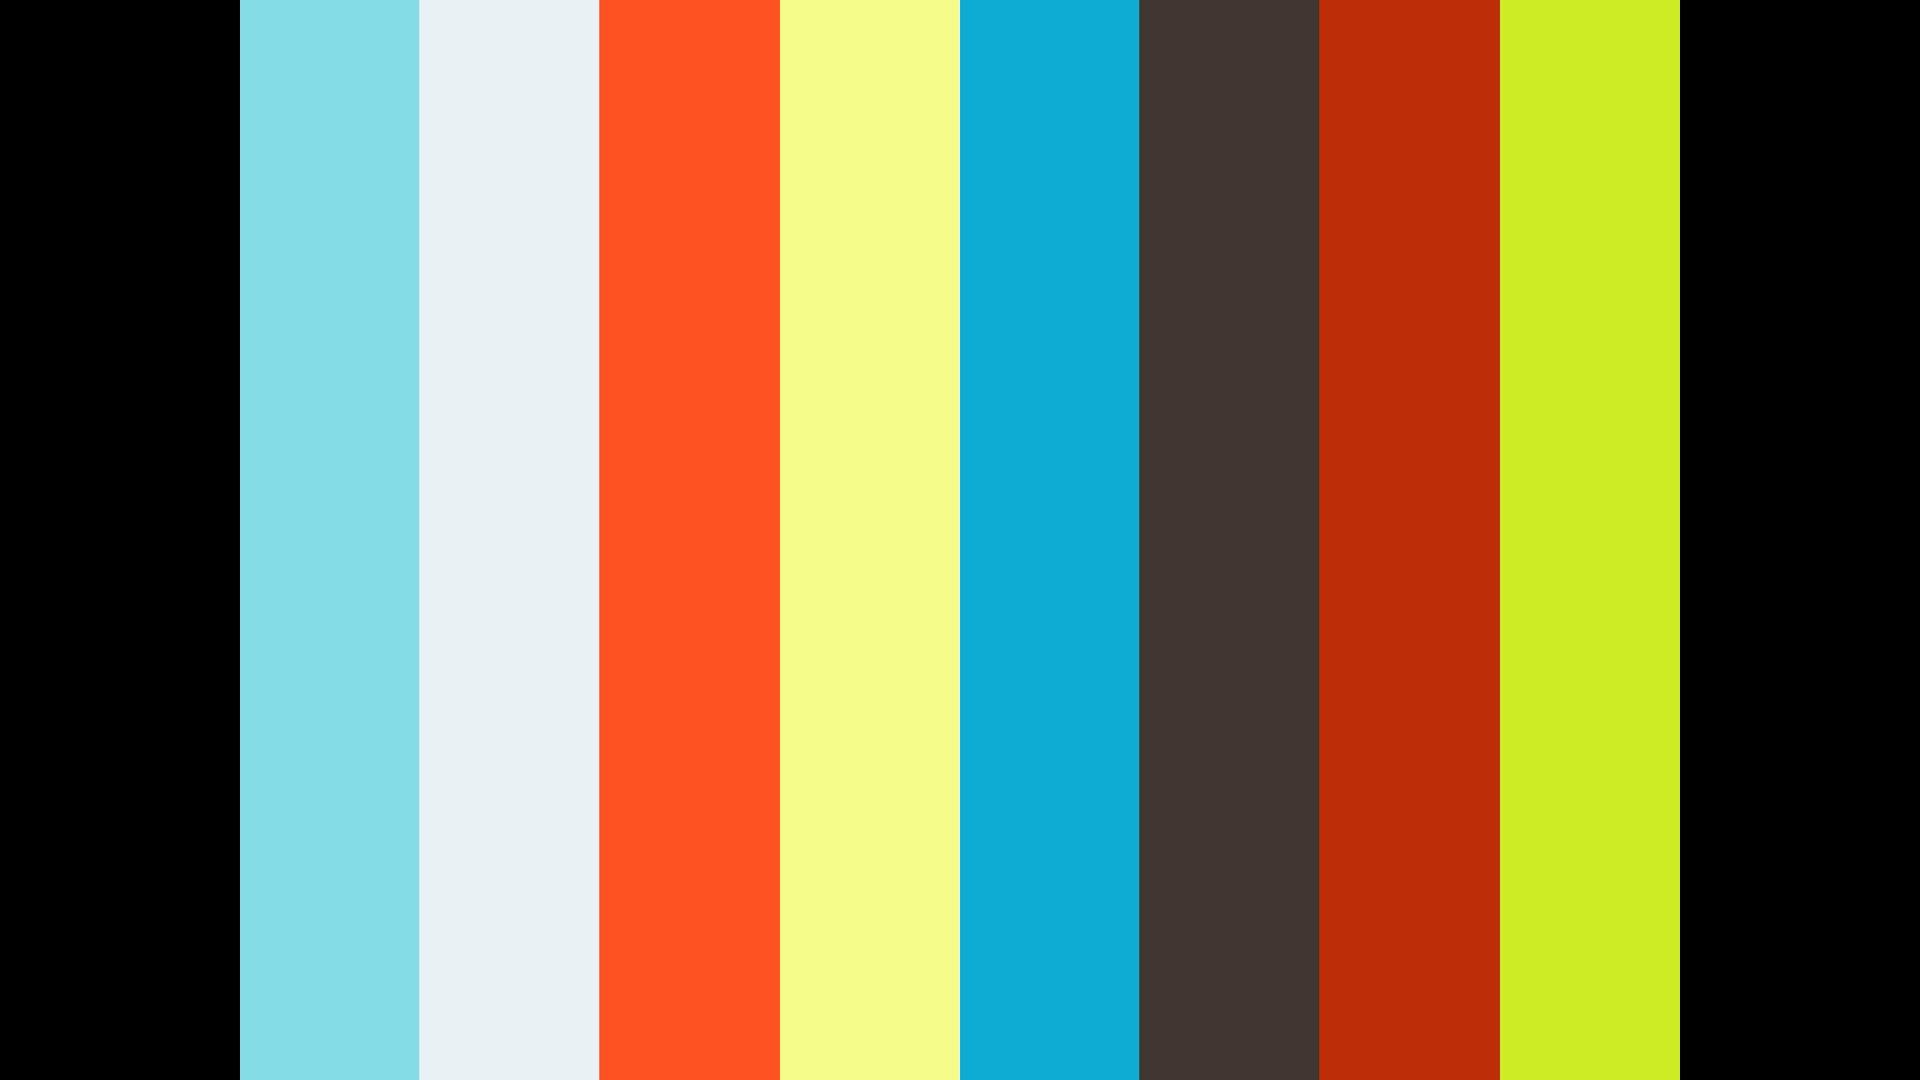 Josh Giddey #BVAwards Acceptance Speech